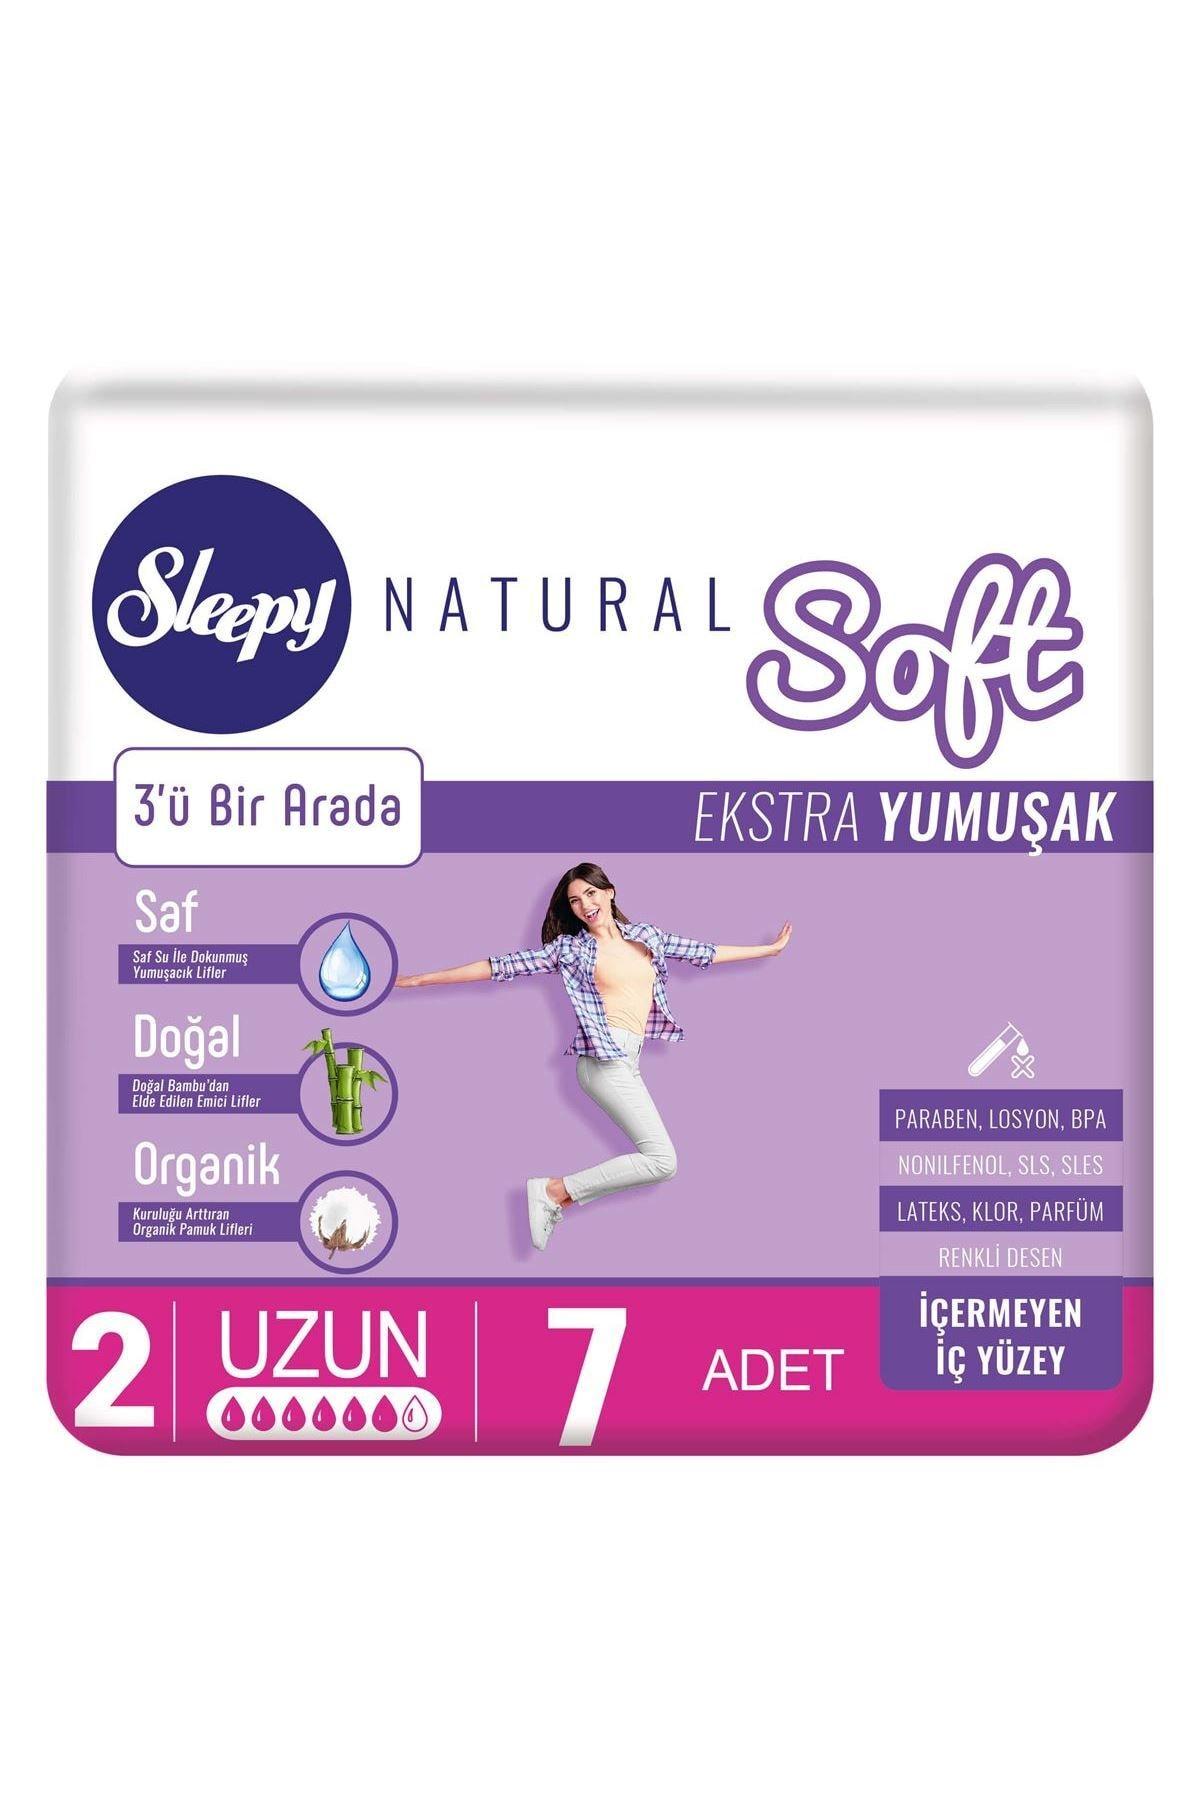 Sleepy Natural Soft Ekstra Yumuşak Uzun 7 Ped 0